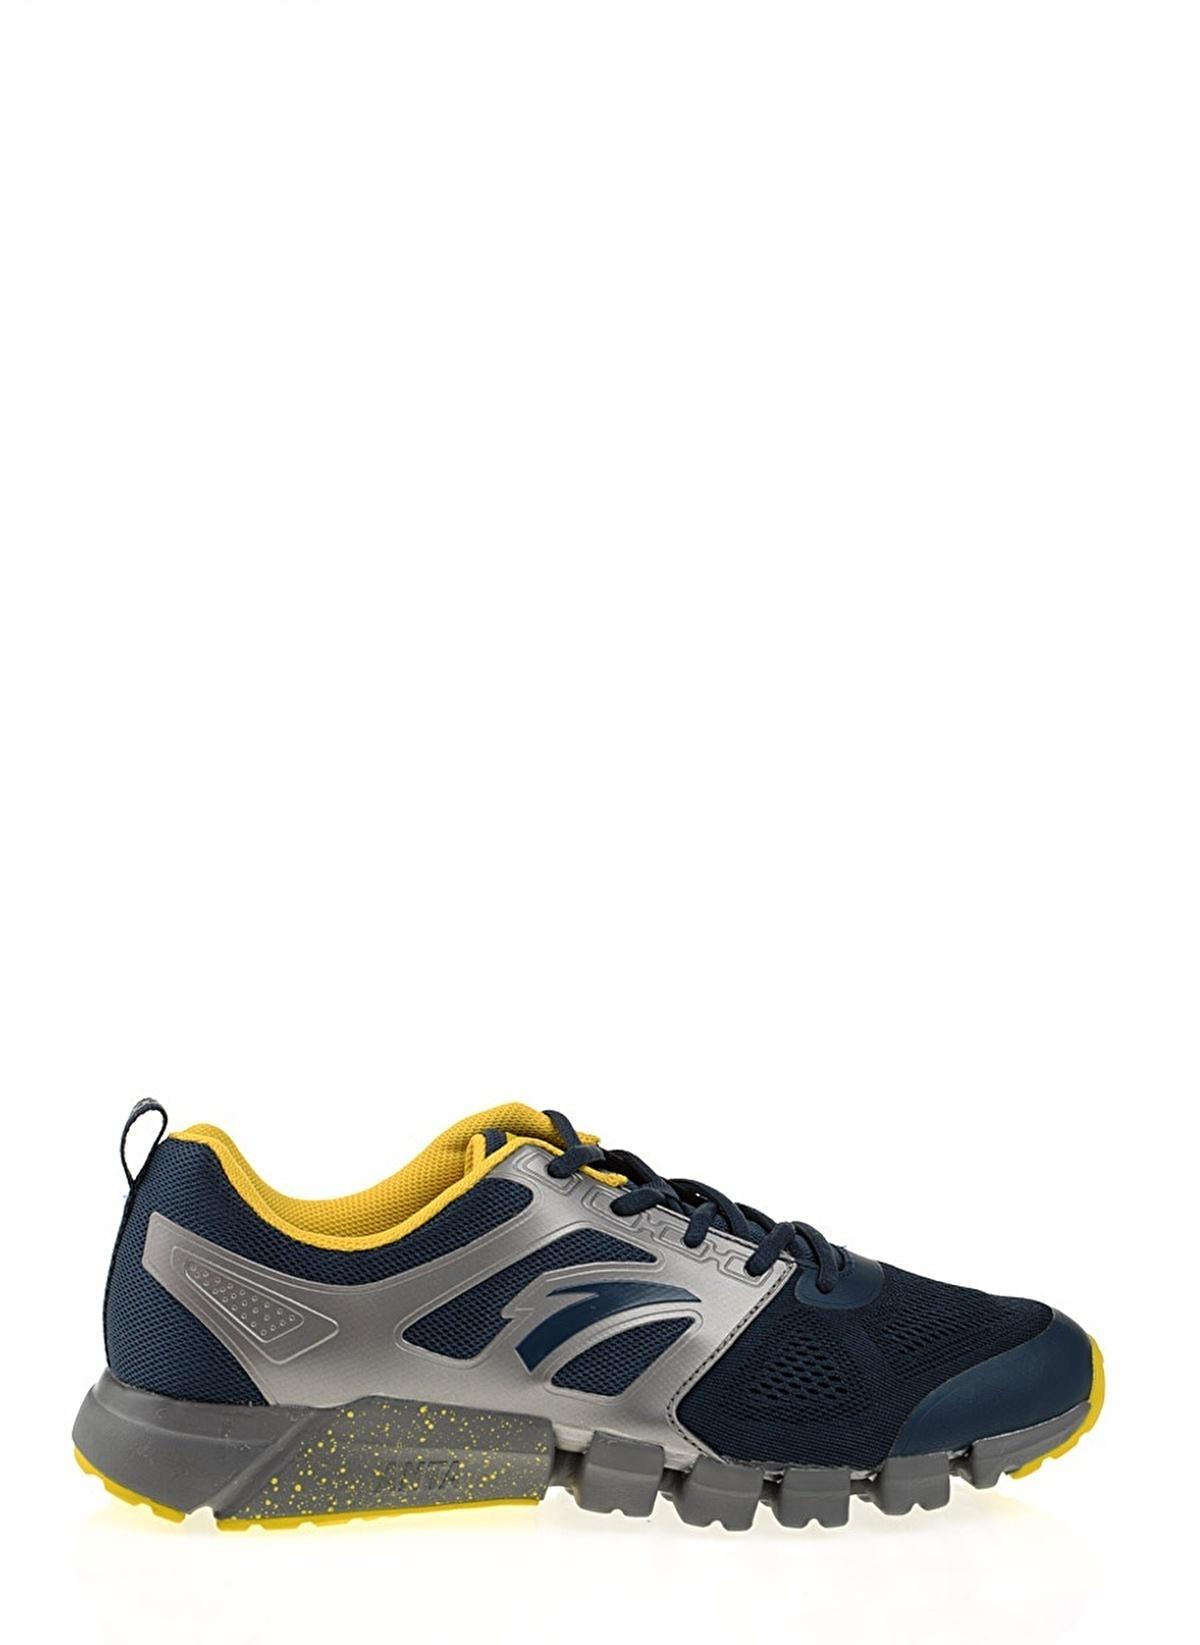 d263fb5f4f18 ... Anta Koşu Ayakkabısı Mavi ...